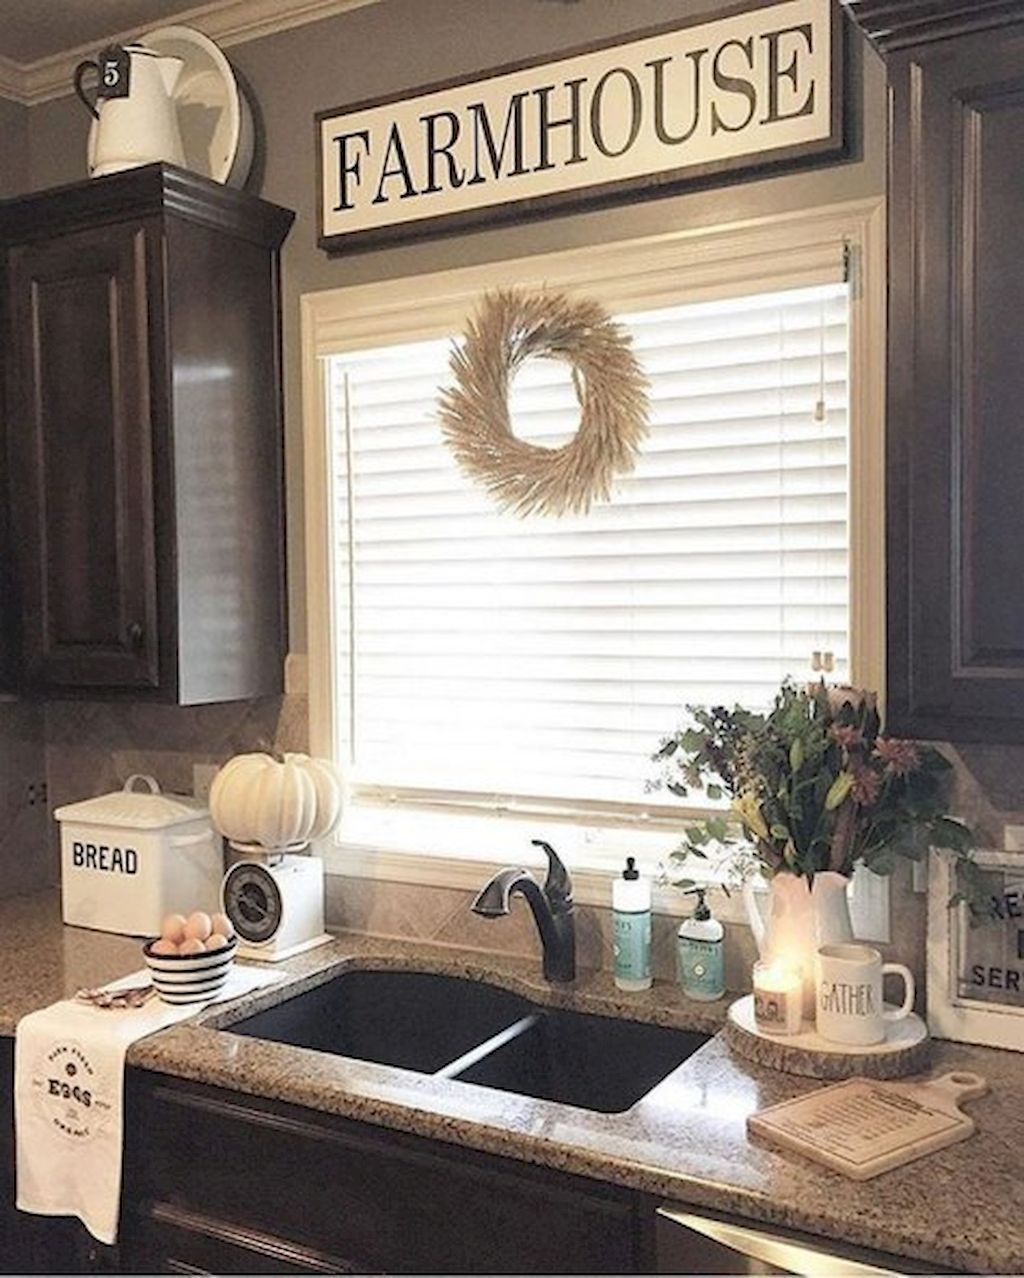 60 Affordable Farmhouse Kitchen Ideas On A Budget Kitchen Ideas